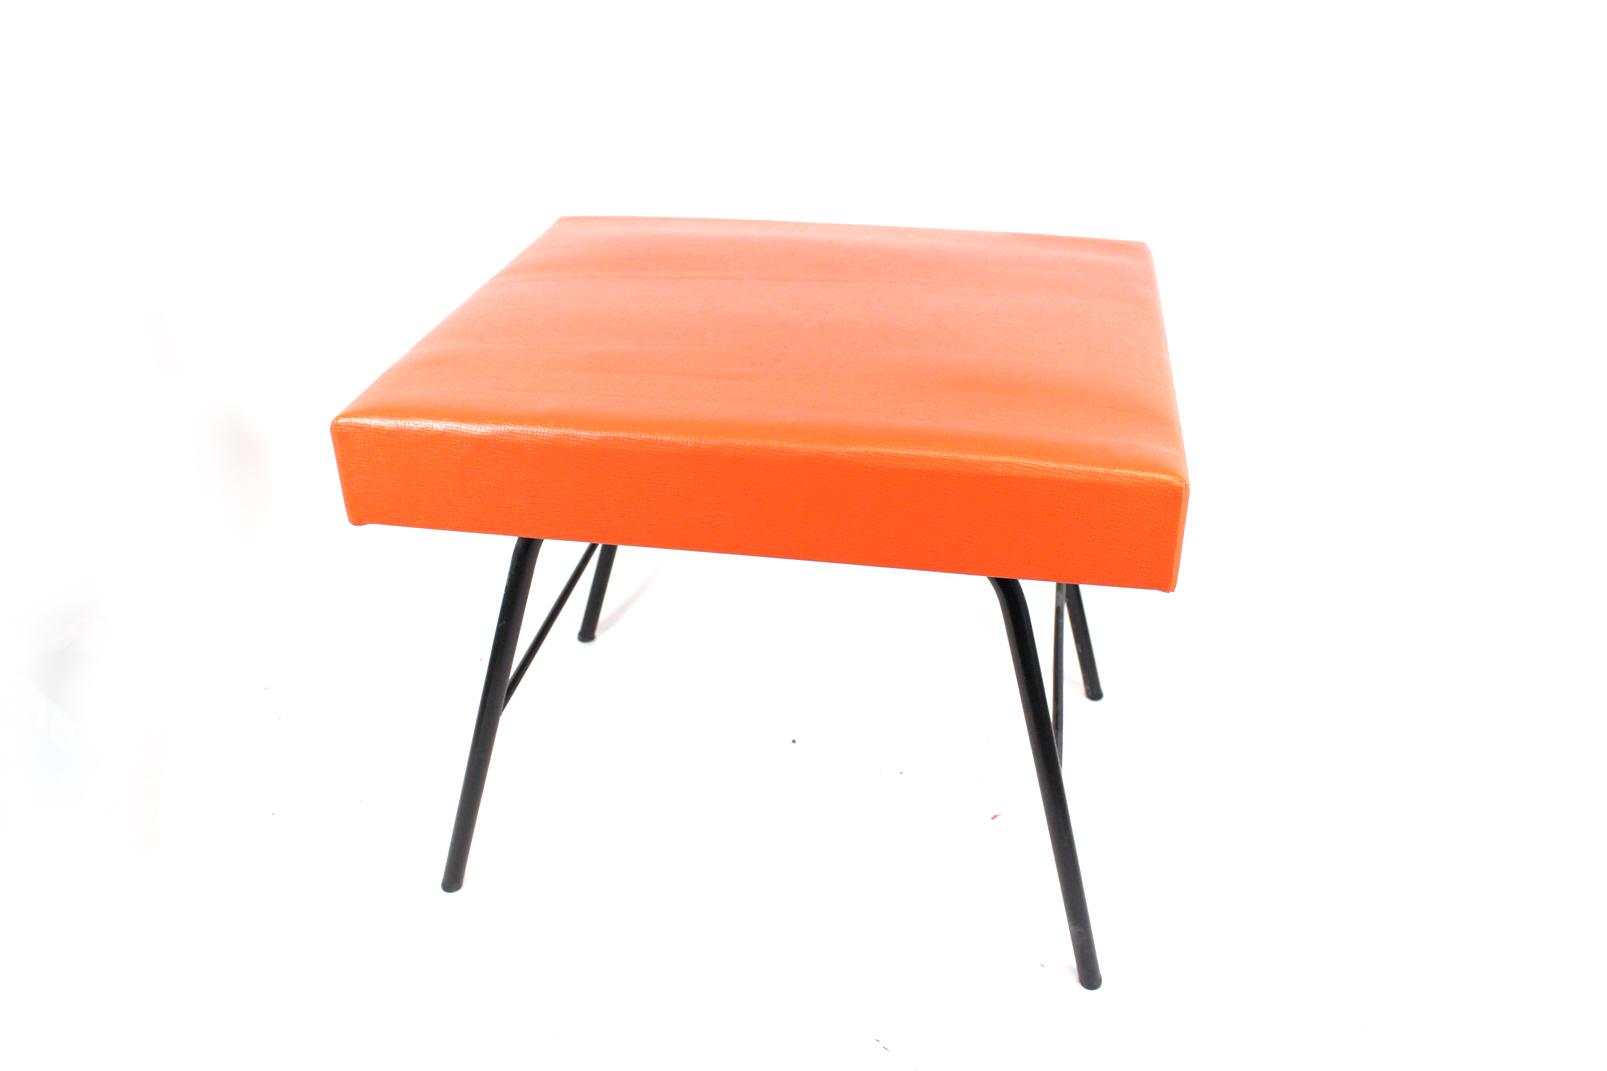 ddr stufenhocker orange tritt leiter polster hocker vem starkstrom anlagenbau ebay. Black Bedroom Furniture Sets. Home Design Ideas